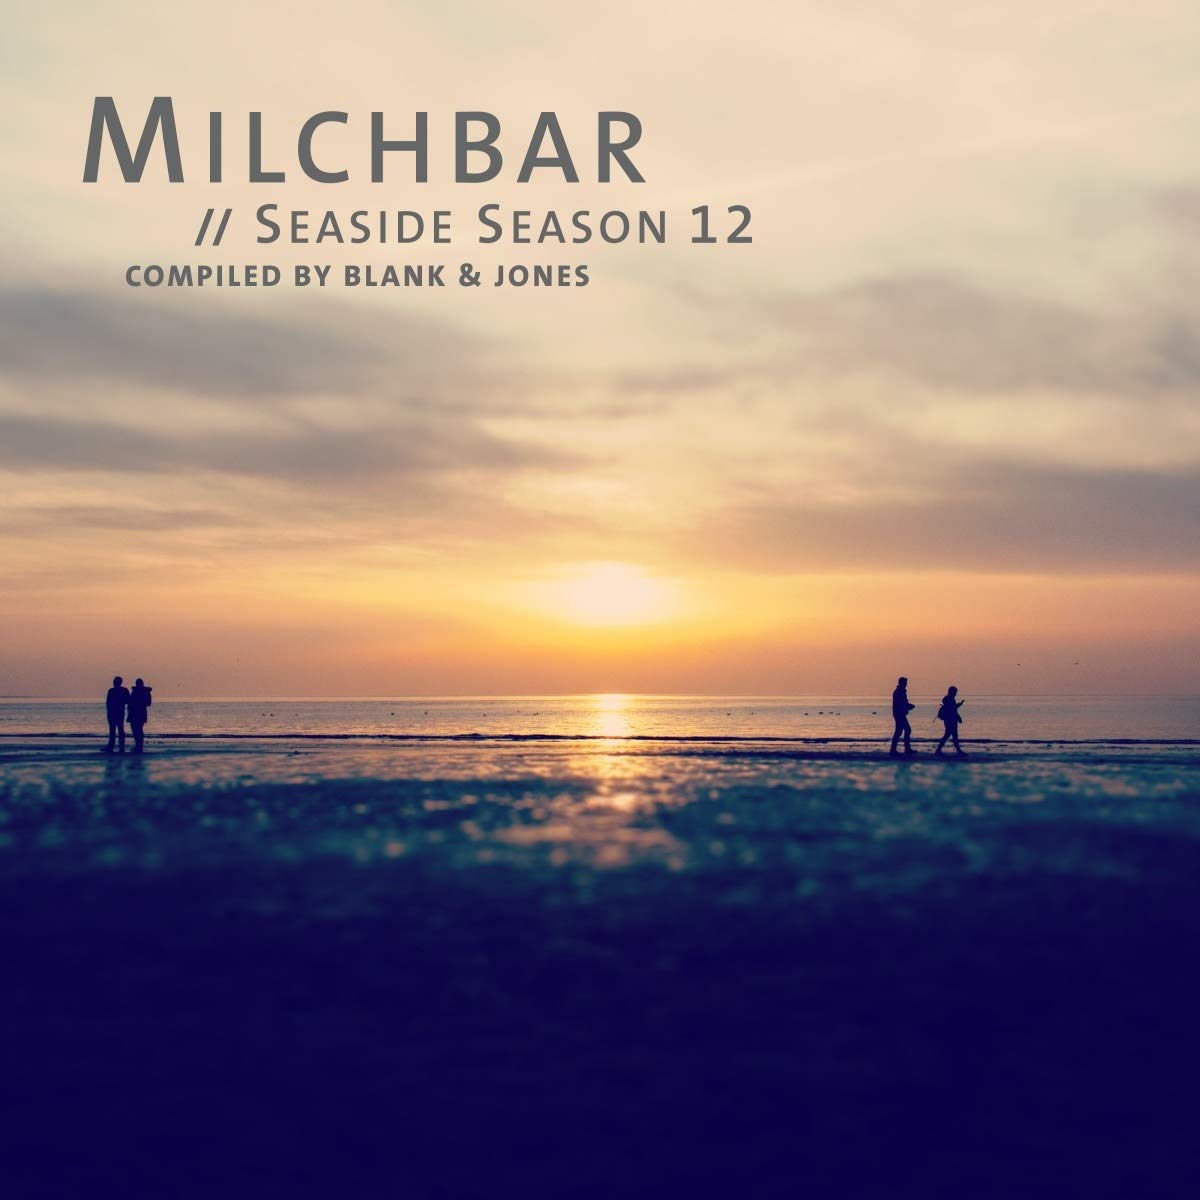 Milchbar Seaside Season 12